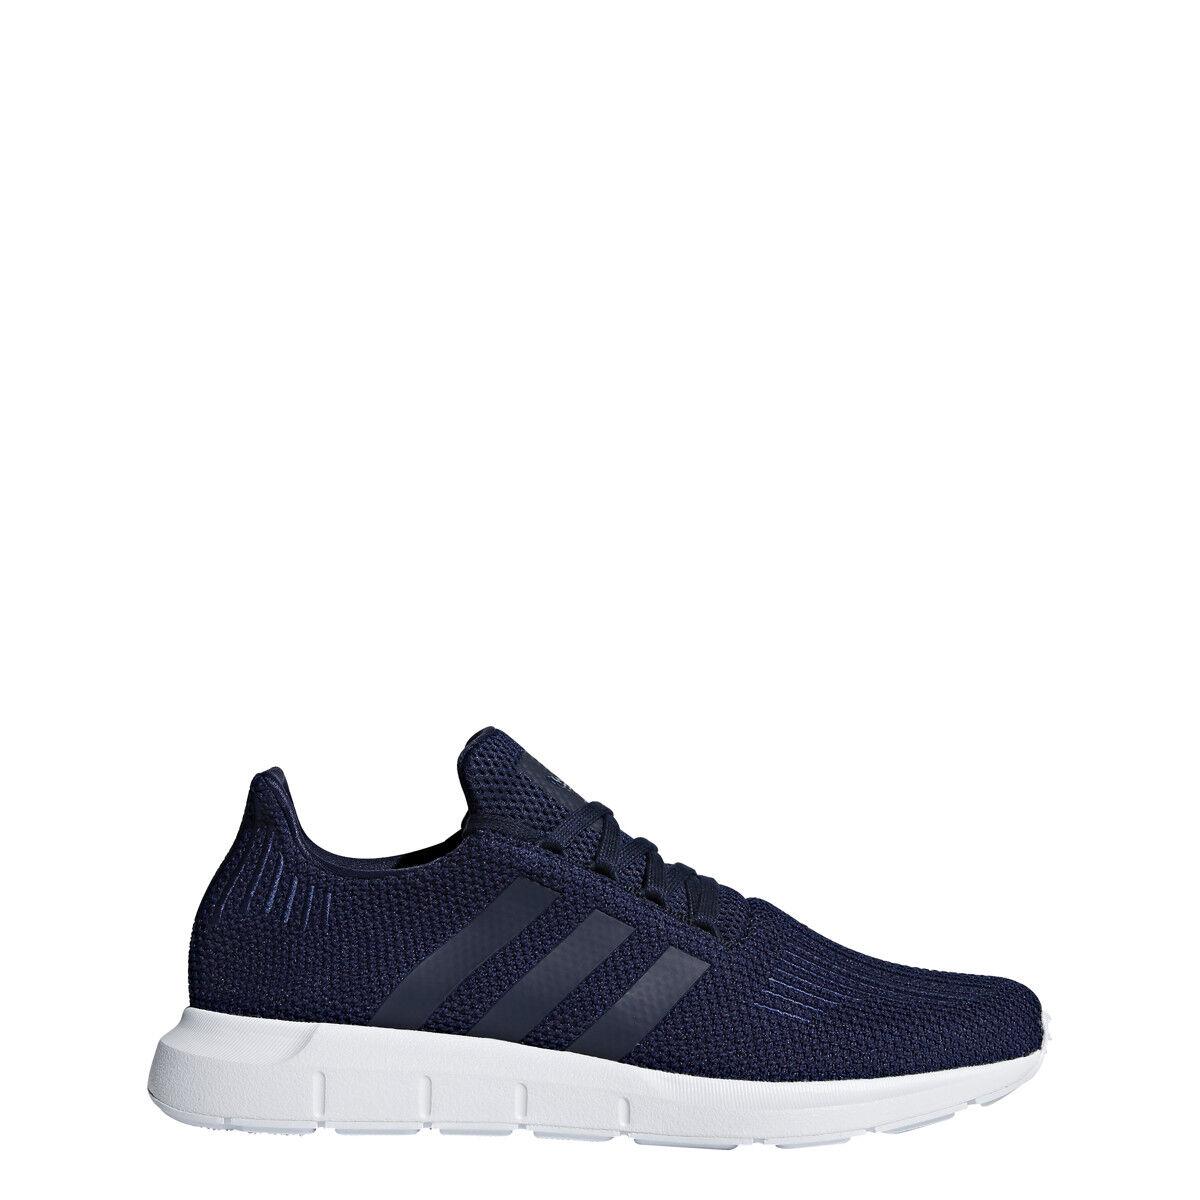 New Adidas Men's Originals Swift Run shoes (B37727)  Collegiate Navy  White